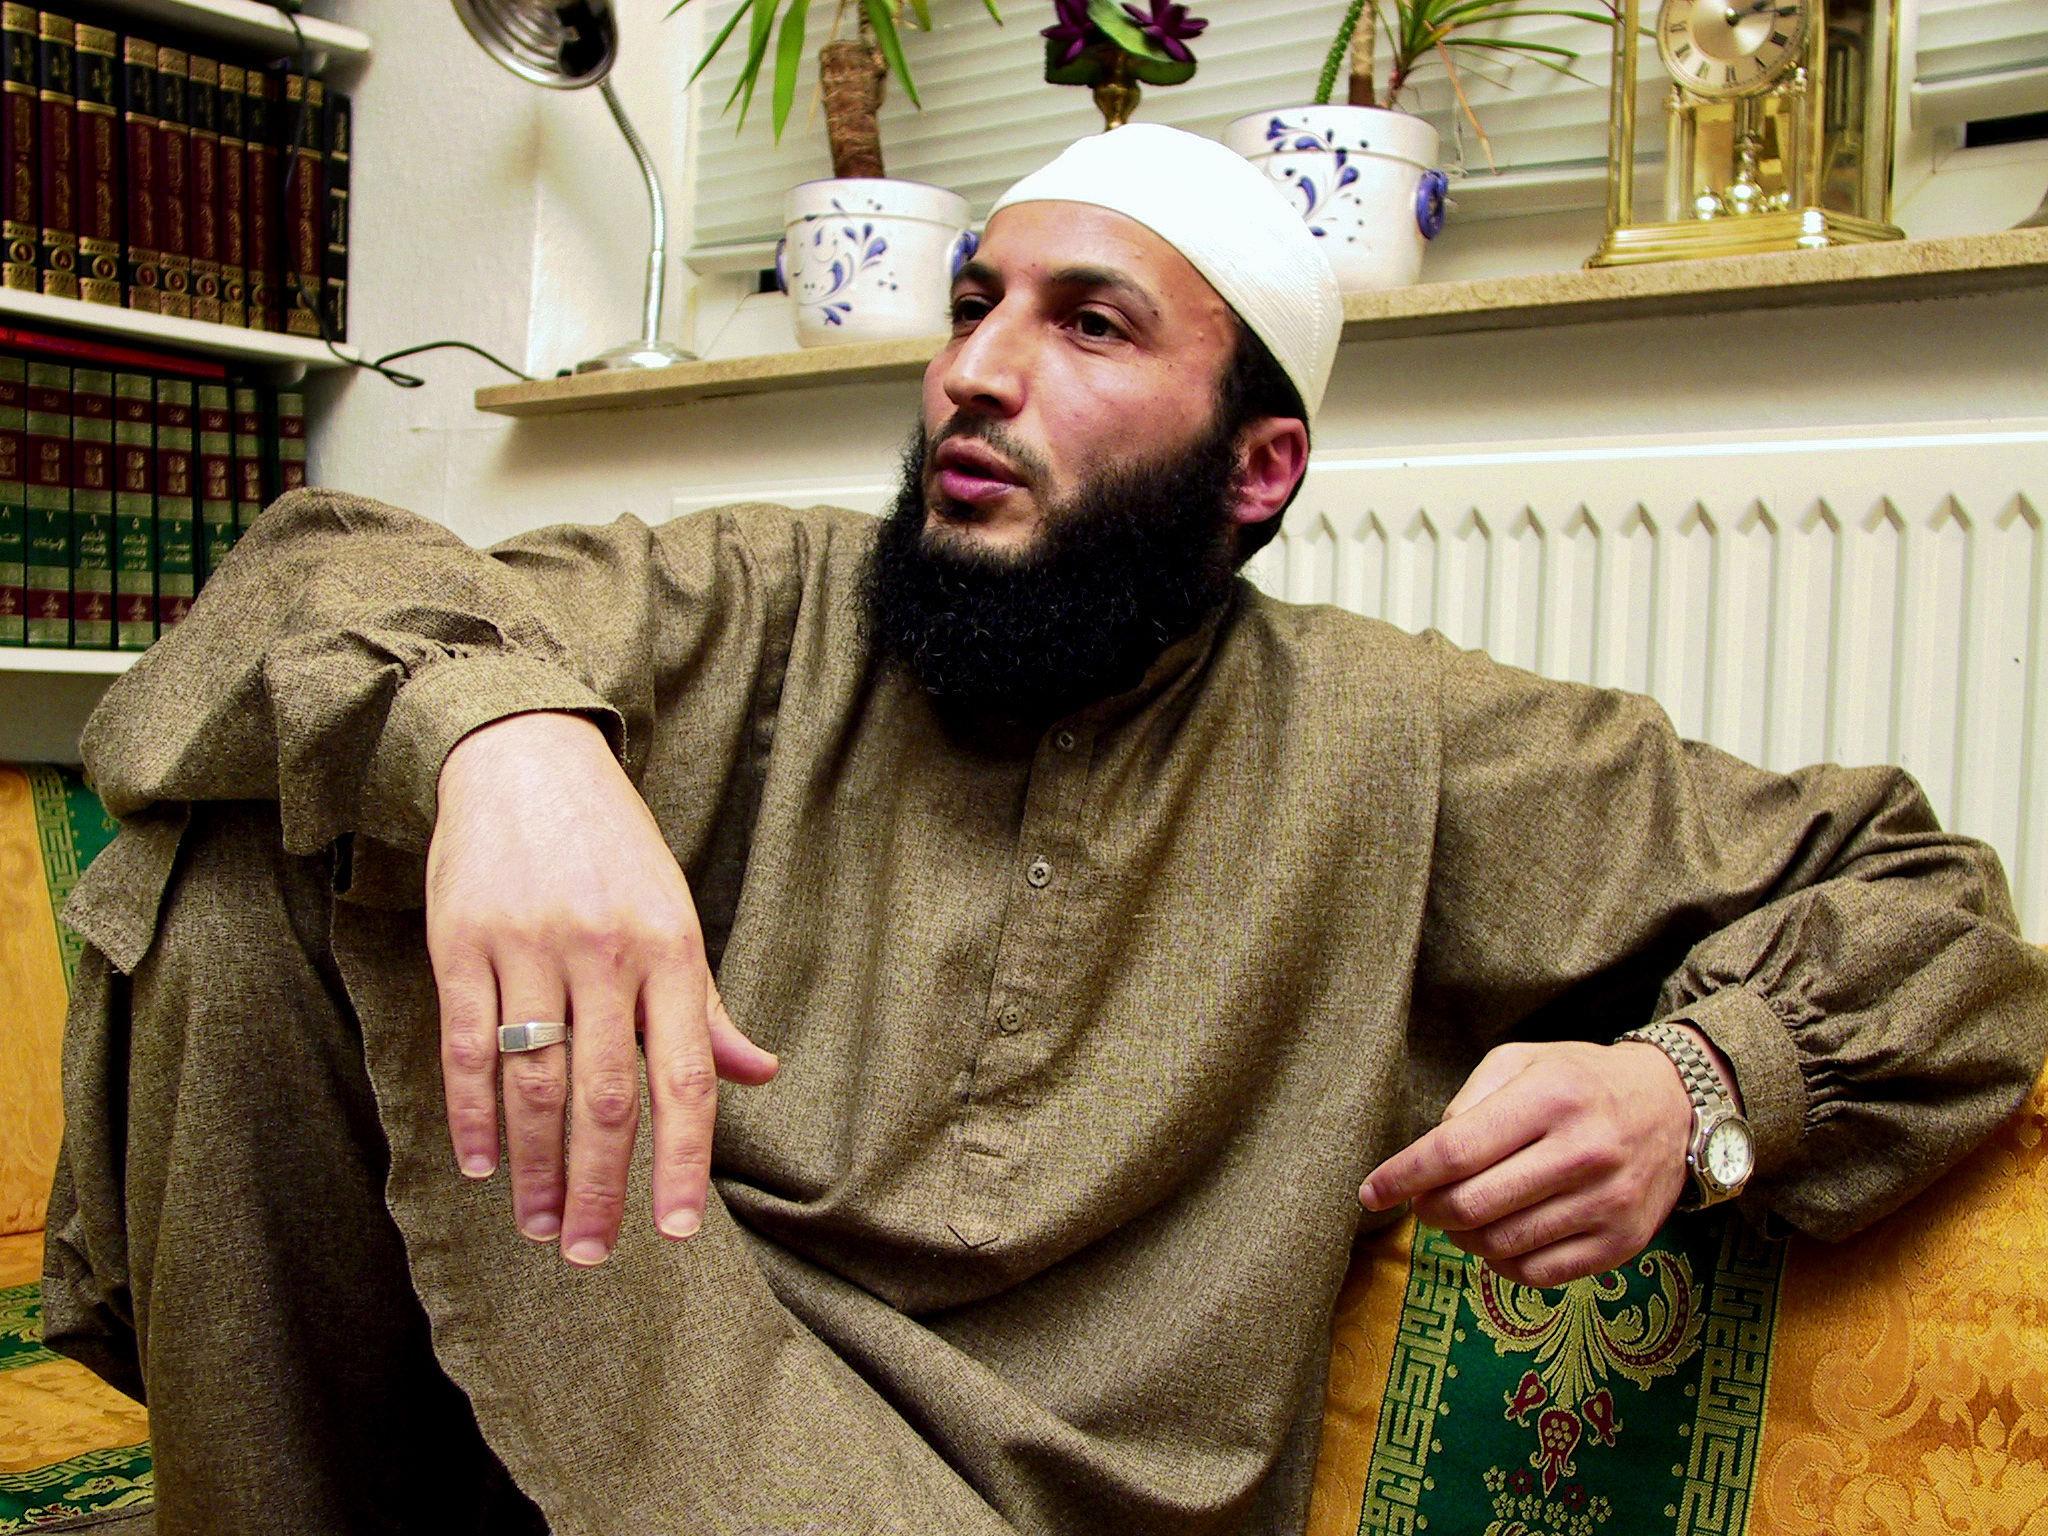 Le Danemark expulse vers le Maroc Said Mansour, propagandiste d'Al